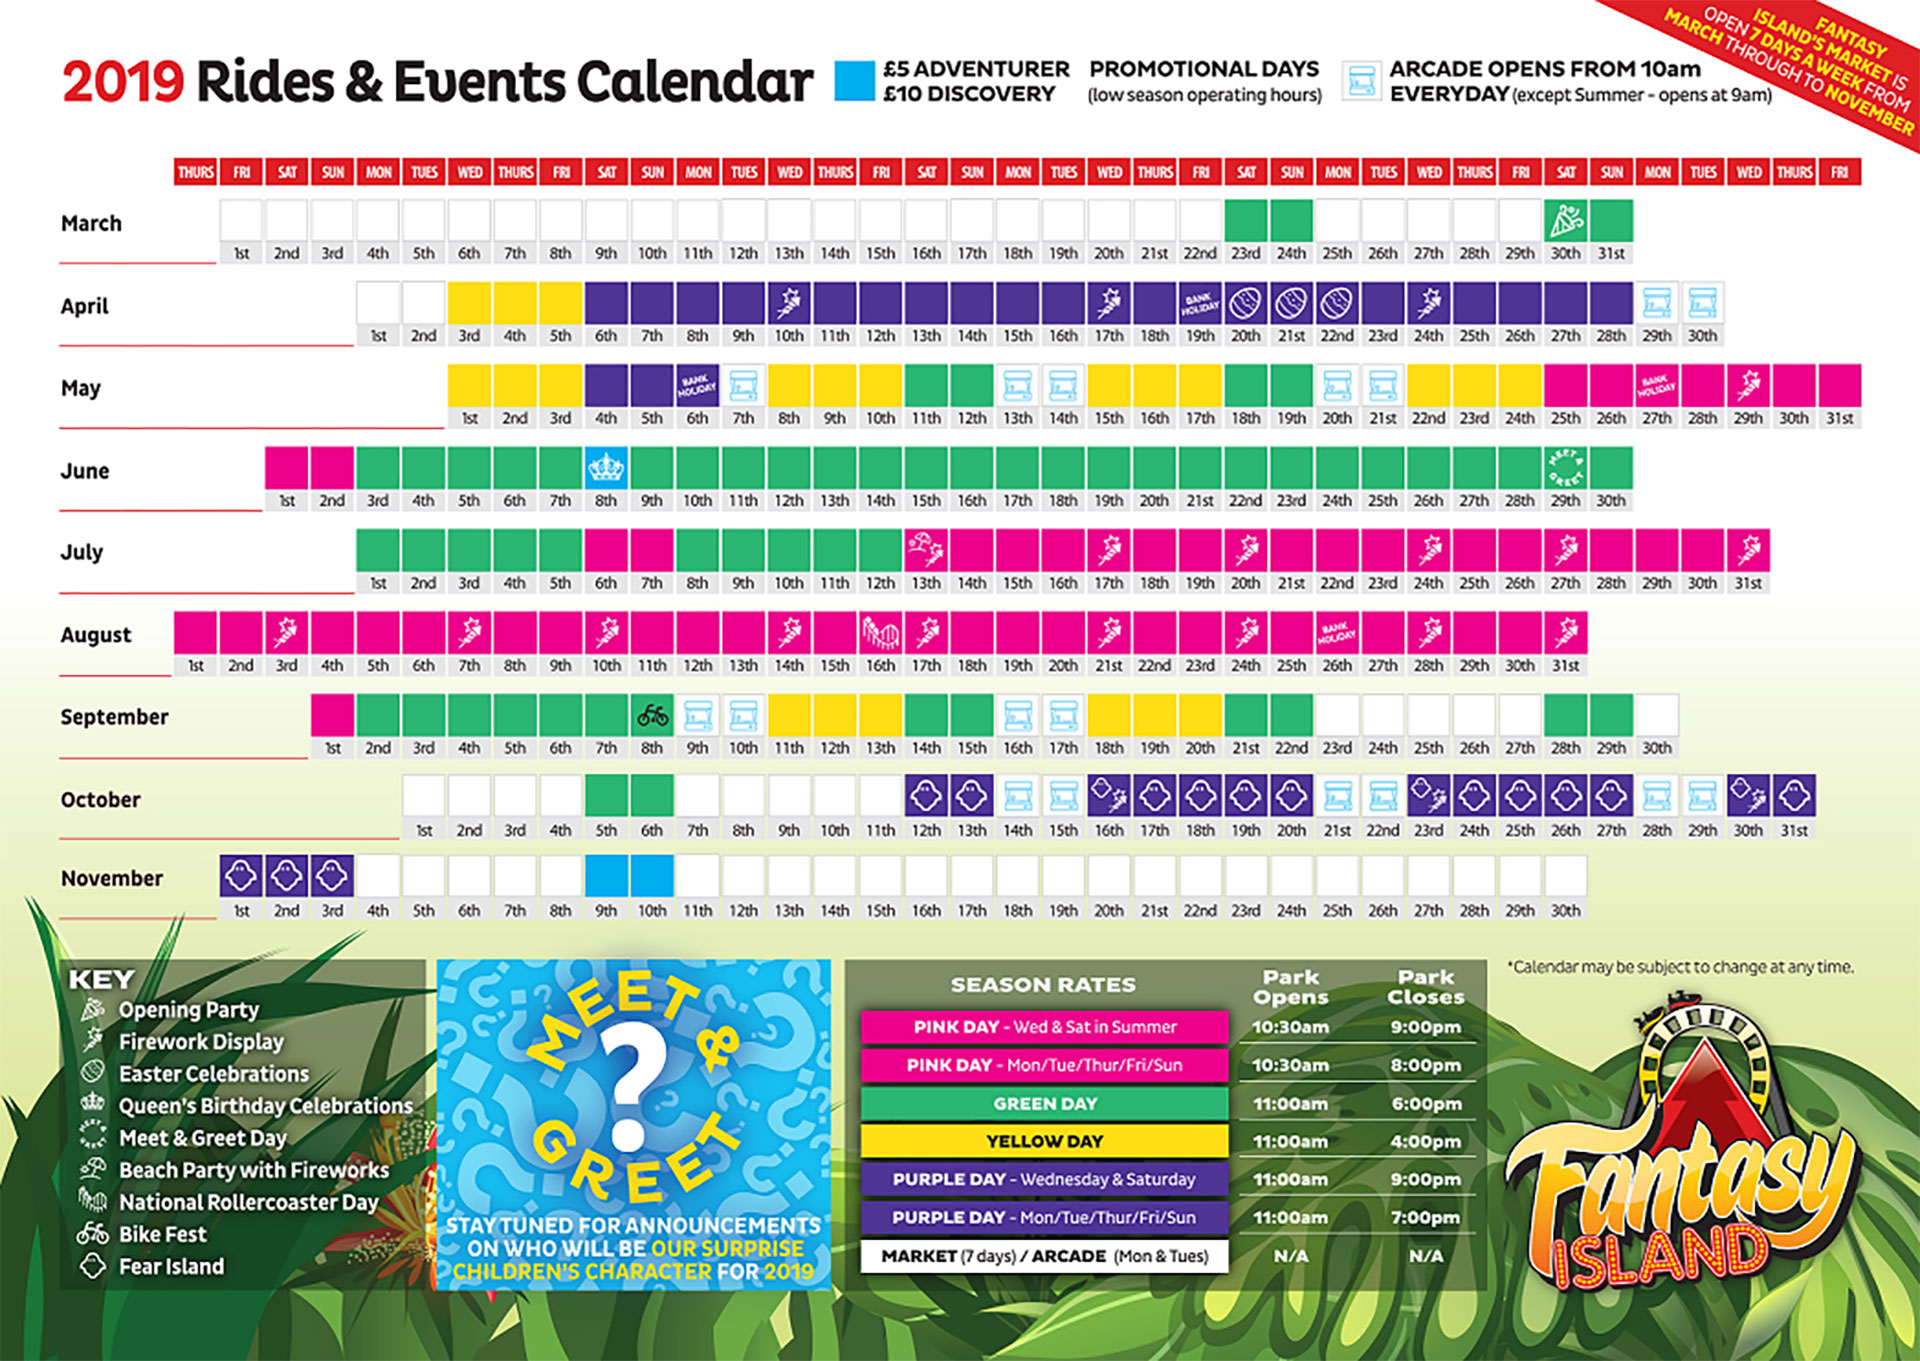 Rides Calendar & Prices | Fantasy Island